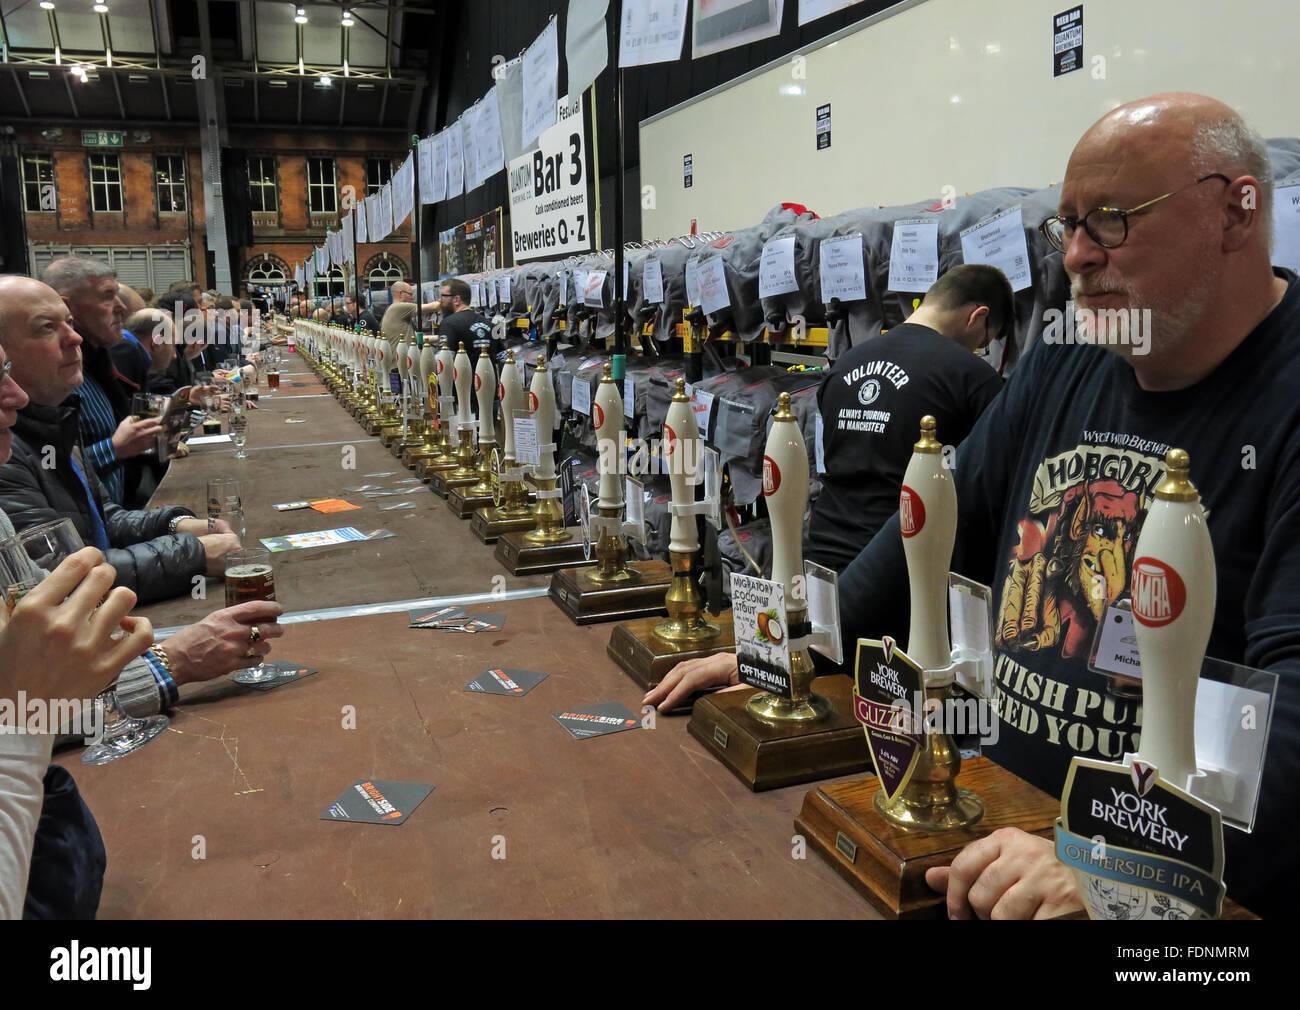 Laden Sie dieses Alamy Stockfoto An der Bar des Manchester Central CAMRA Winter Bierfestival 2016, Lancs, England, UK - FDNMRM